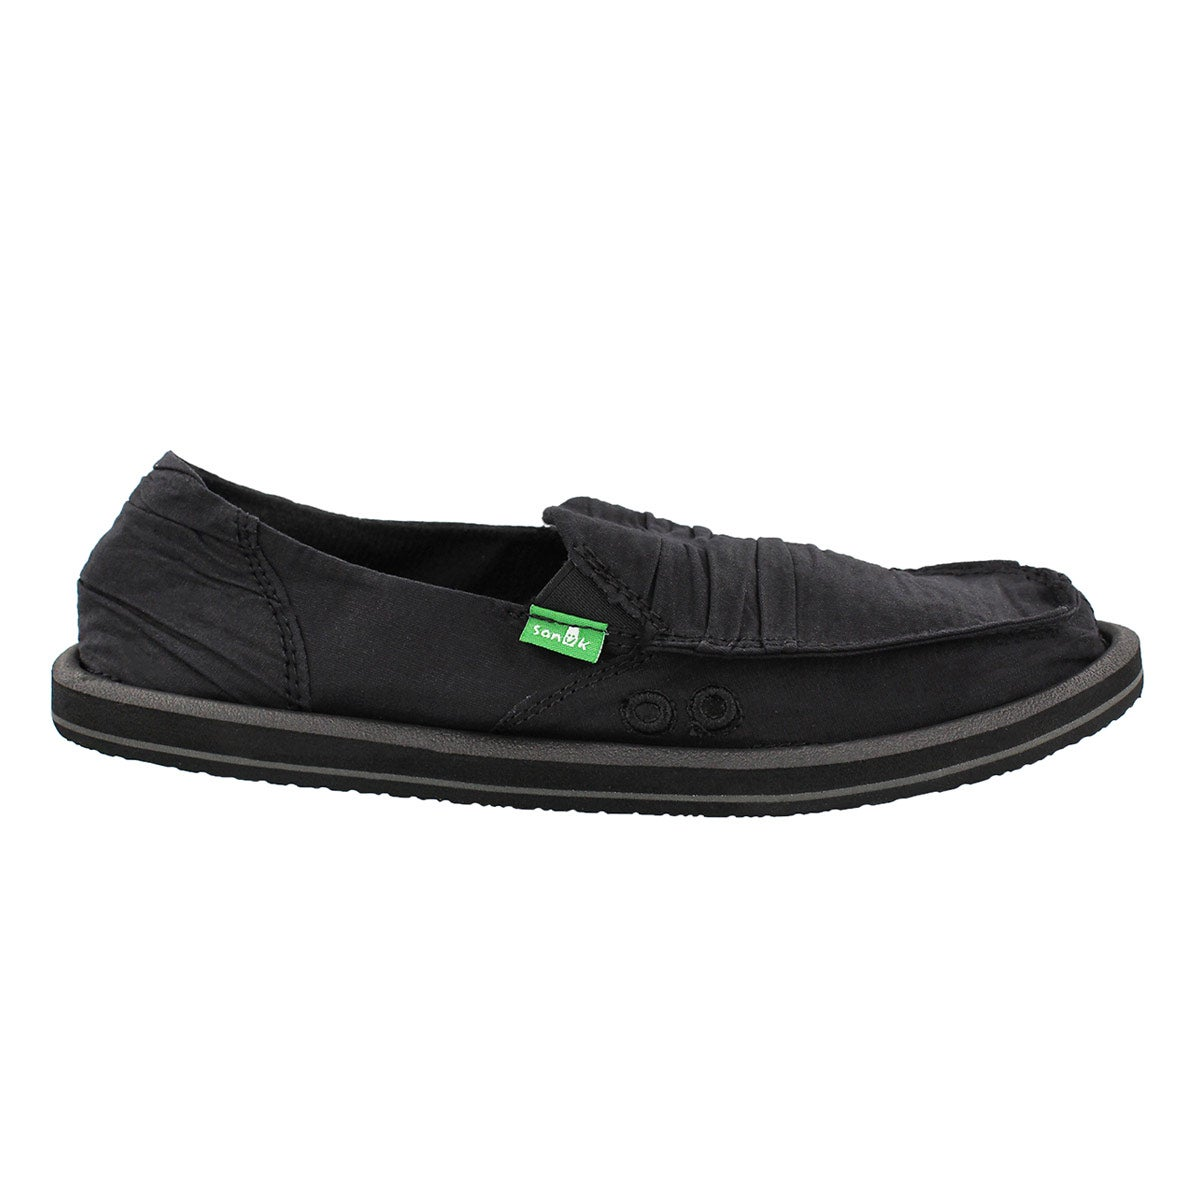 Lds Shuffle black slip on shoe